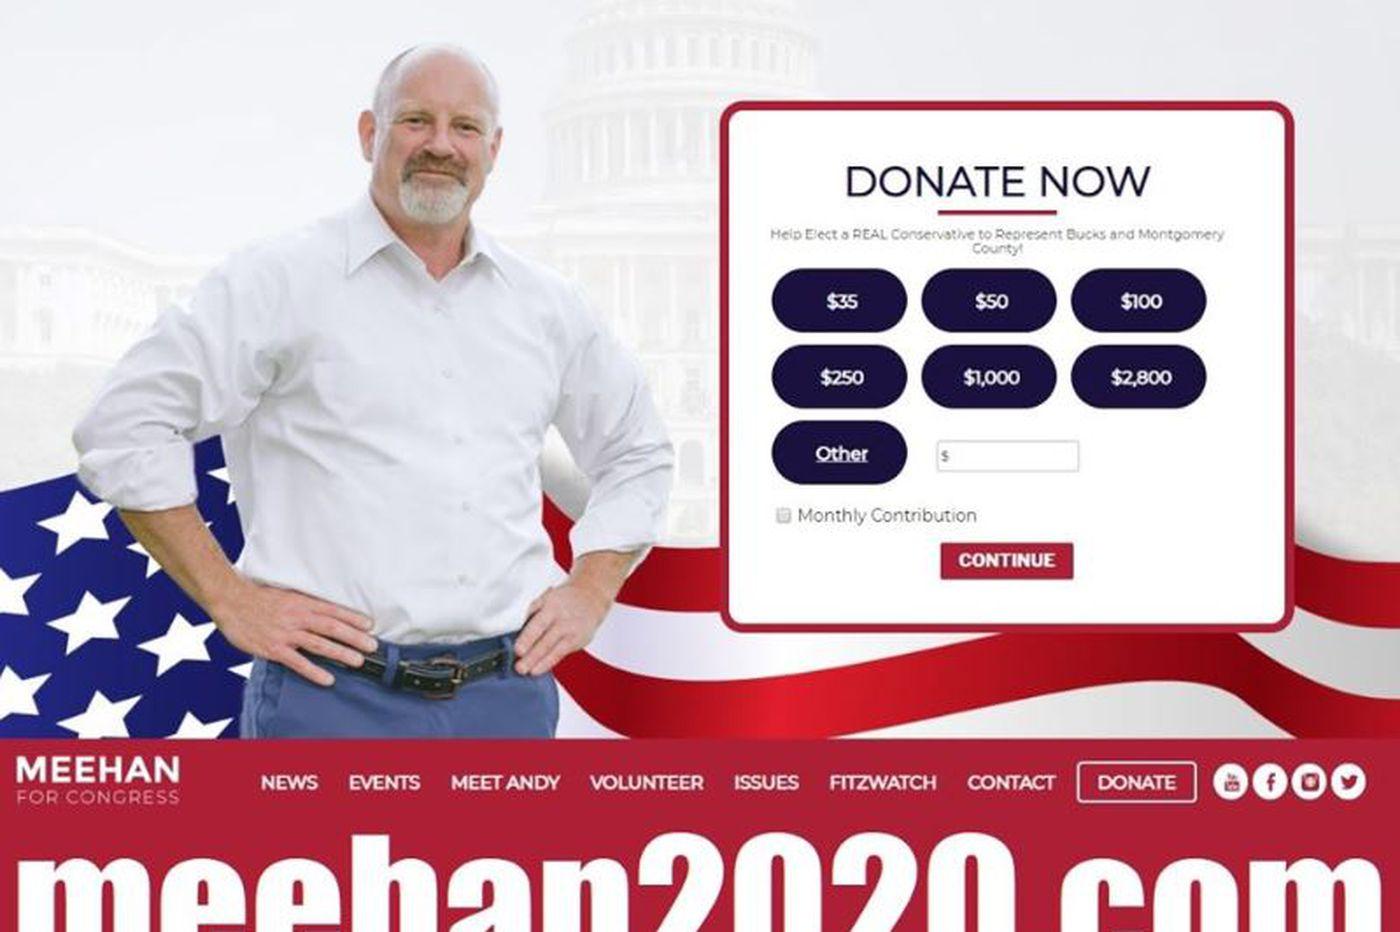 Republicans are denouncing Brian Fitzpatrick's primary opponent for 'discriminatory' social media posts, secret recordings